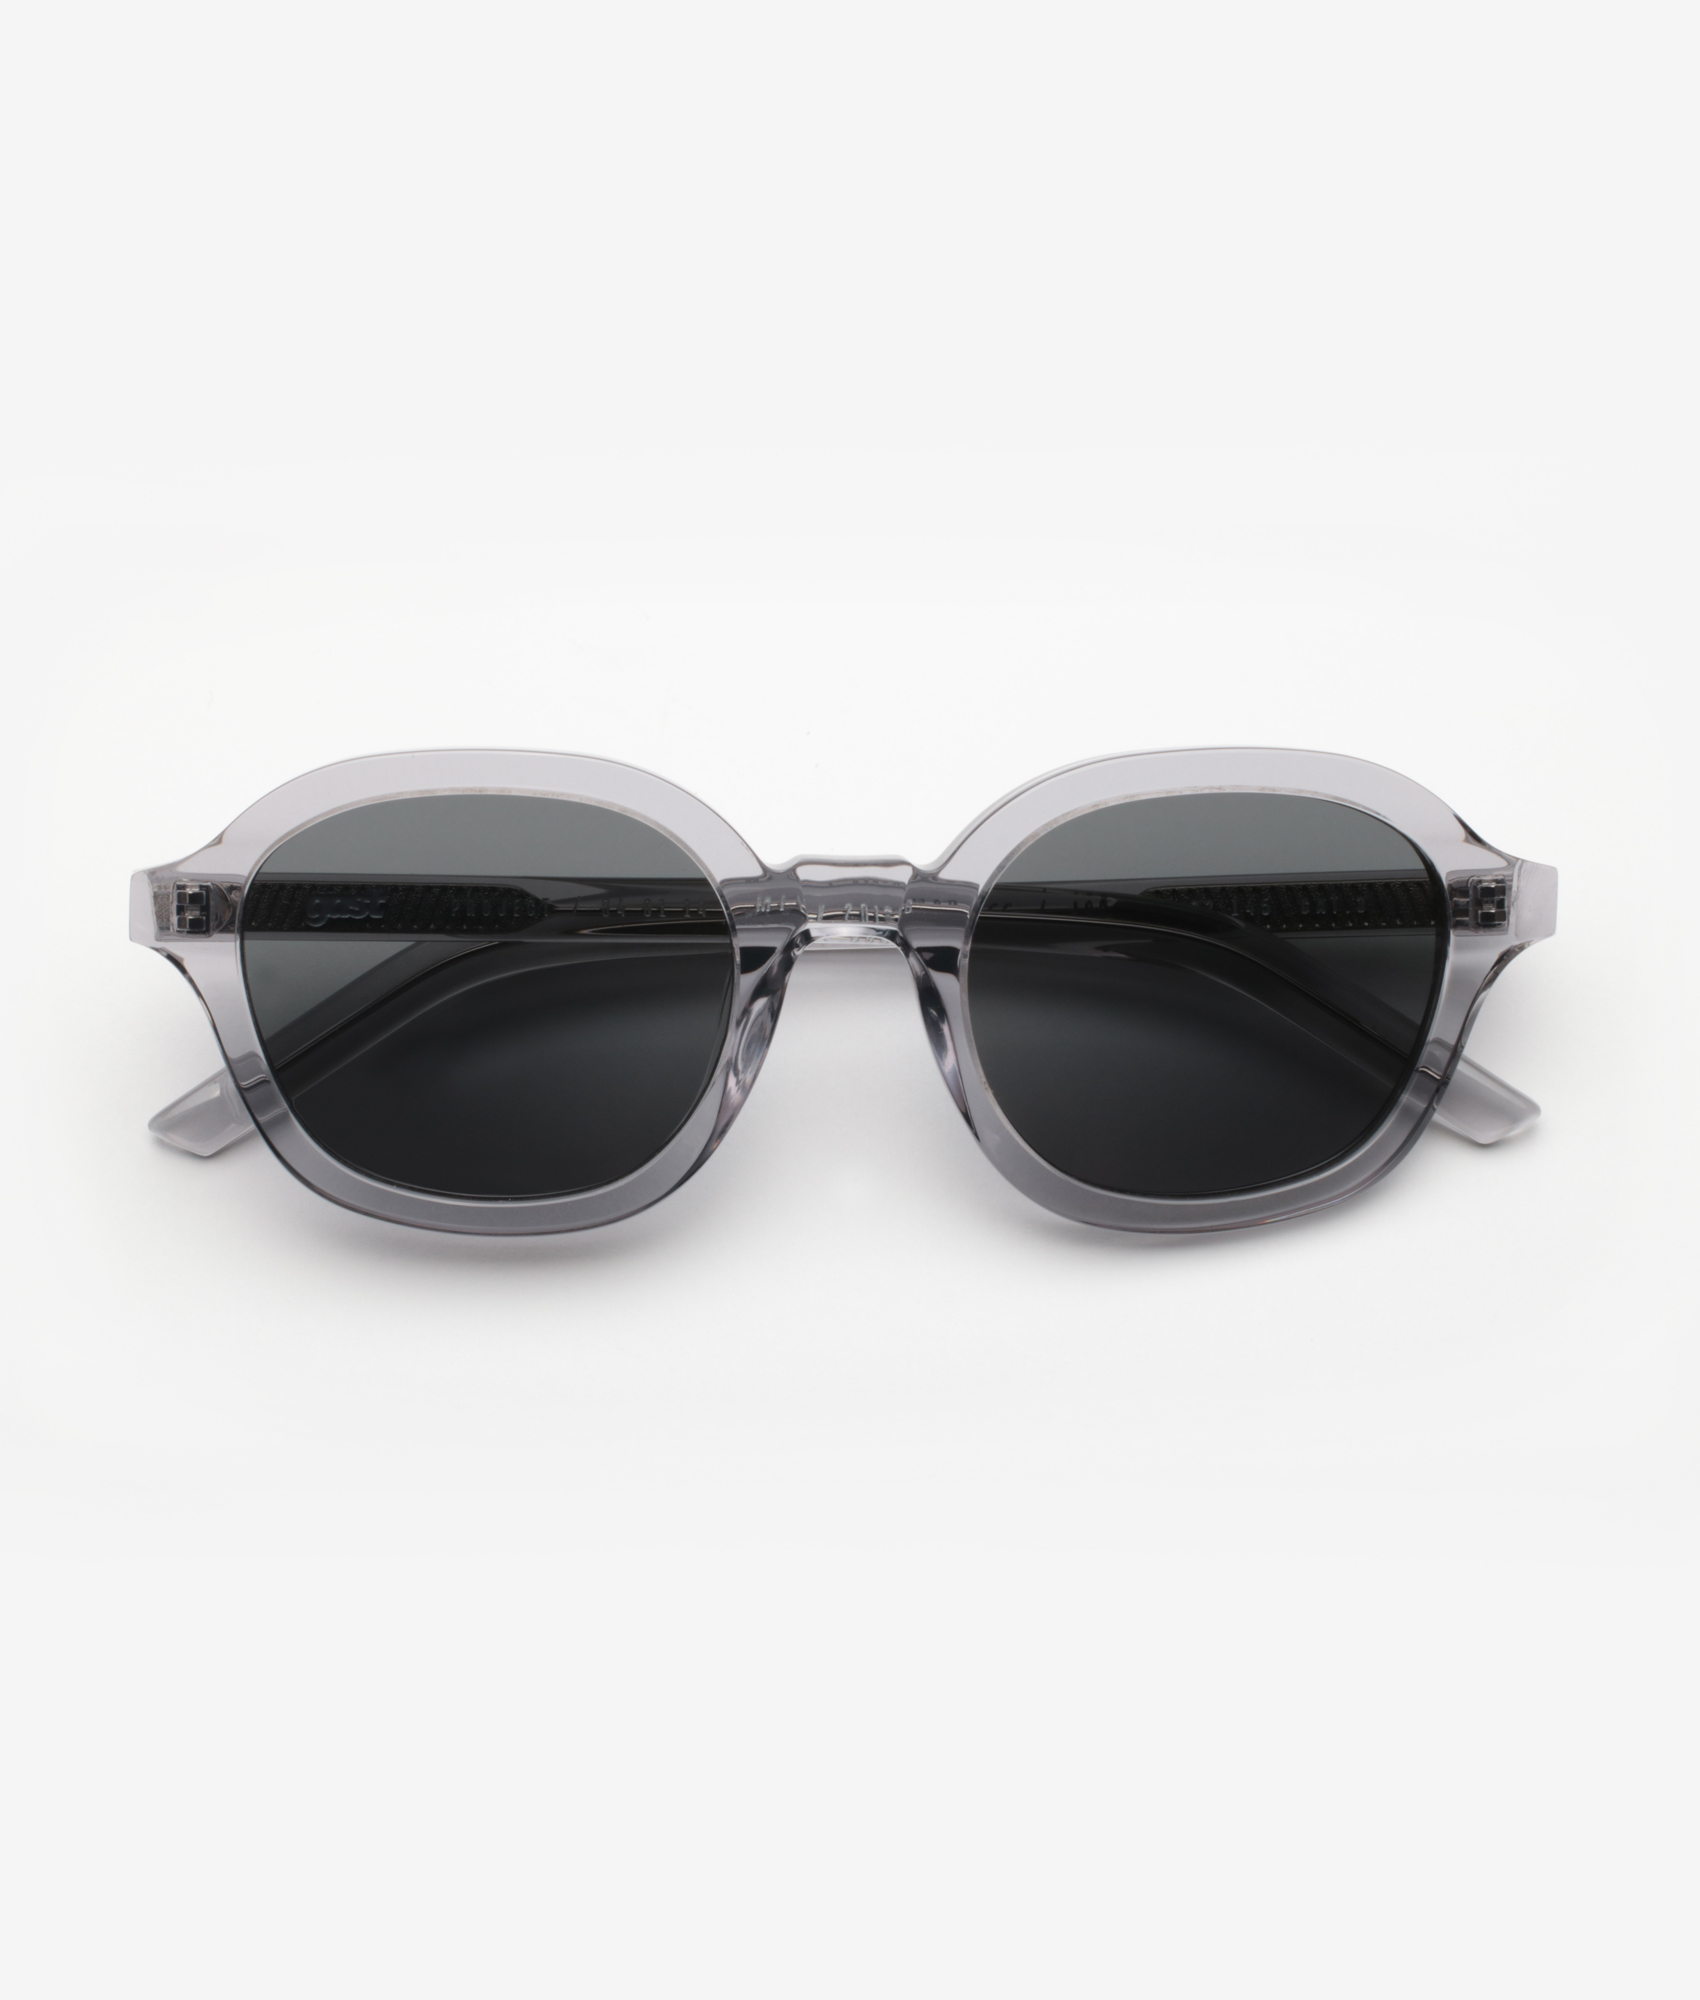 Mein lava grey Gast Sunglasses